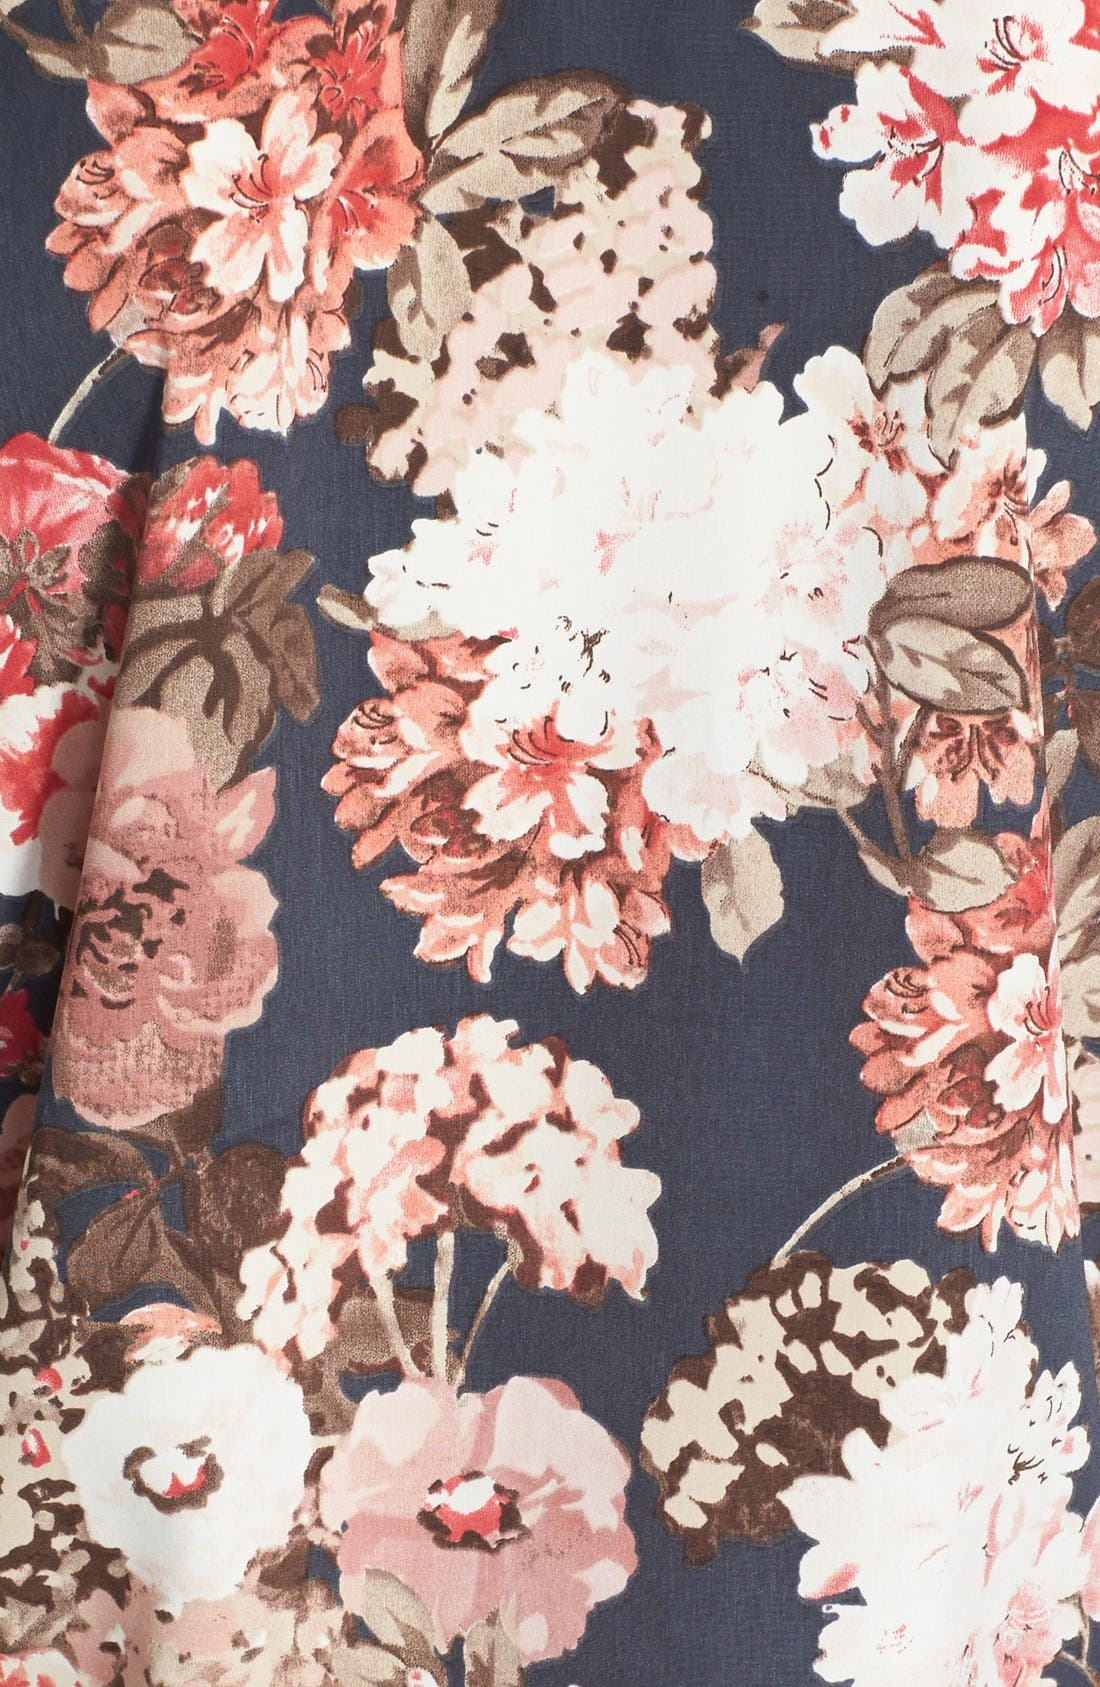 Floral Print Raglan Sweatshirt,                             Alternate thumbnail 4, color,                             020